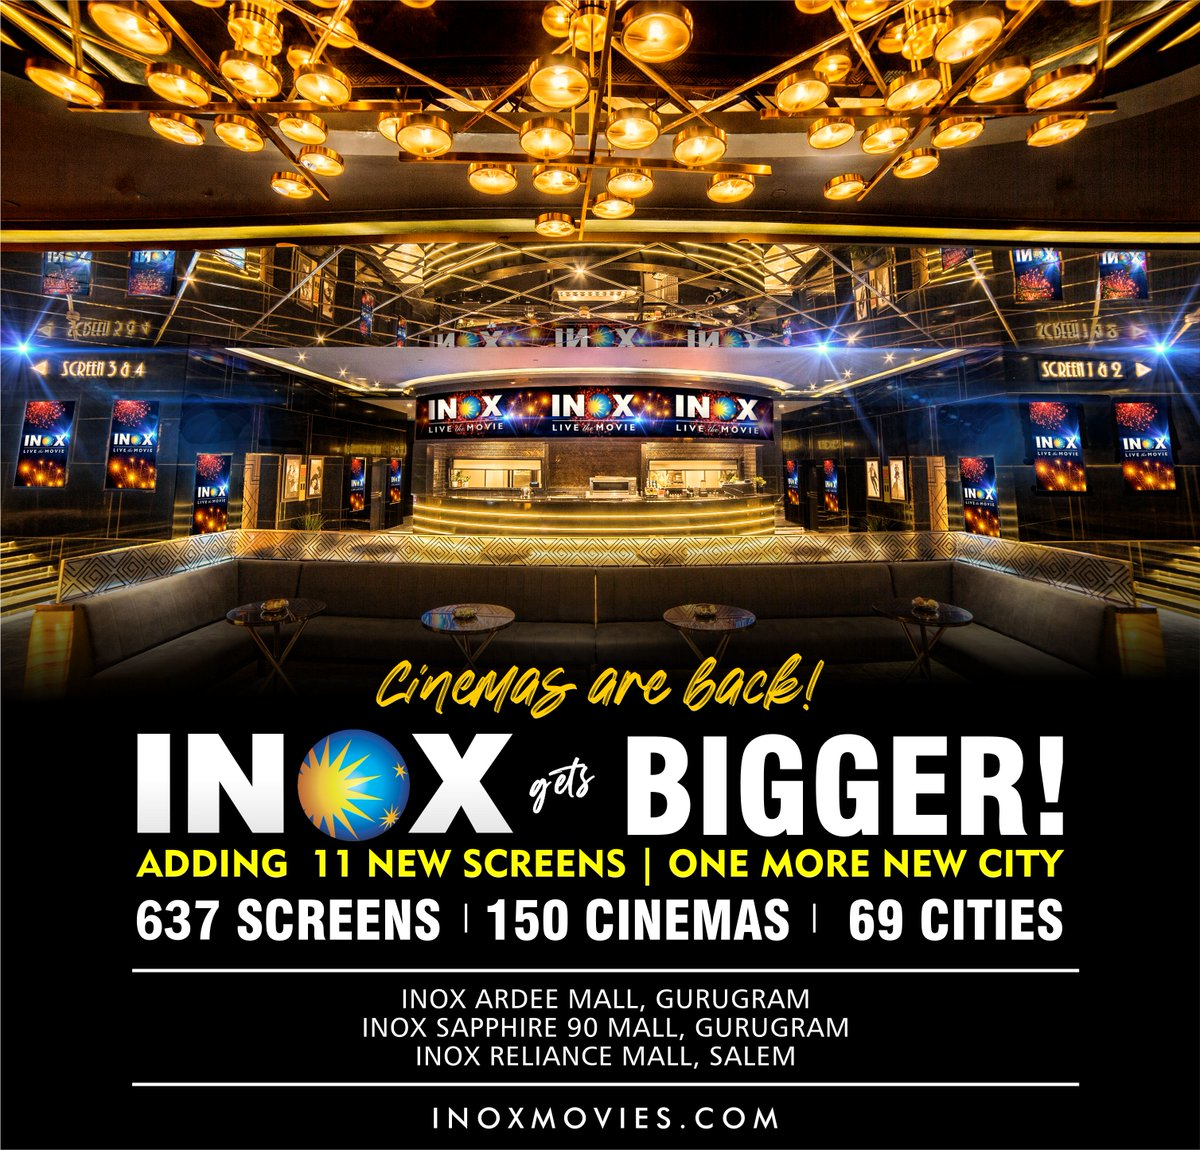 INOX GETS BIGGER! 3 new cinemas 11 new screens 150 multiplexes milestone Opulence, Experiences & Emotions galore at INOX!  It can't get more exciting than this!   #INOXGurugram #INOXSalem #INOXGETSBIGGER #MasterFilm #MasterPongal #HappyLohri2021